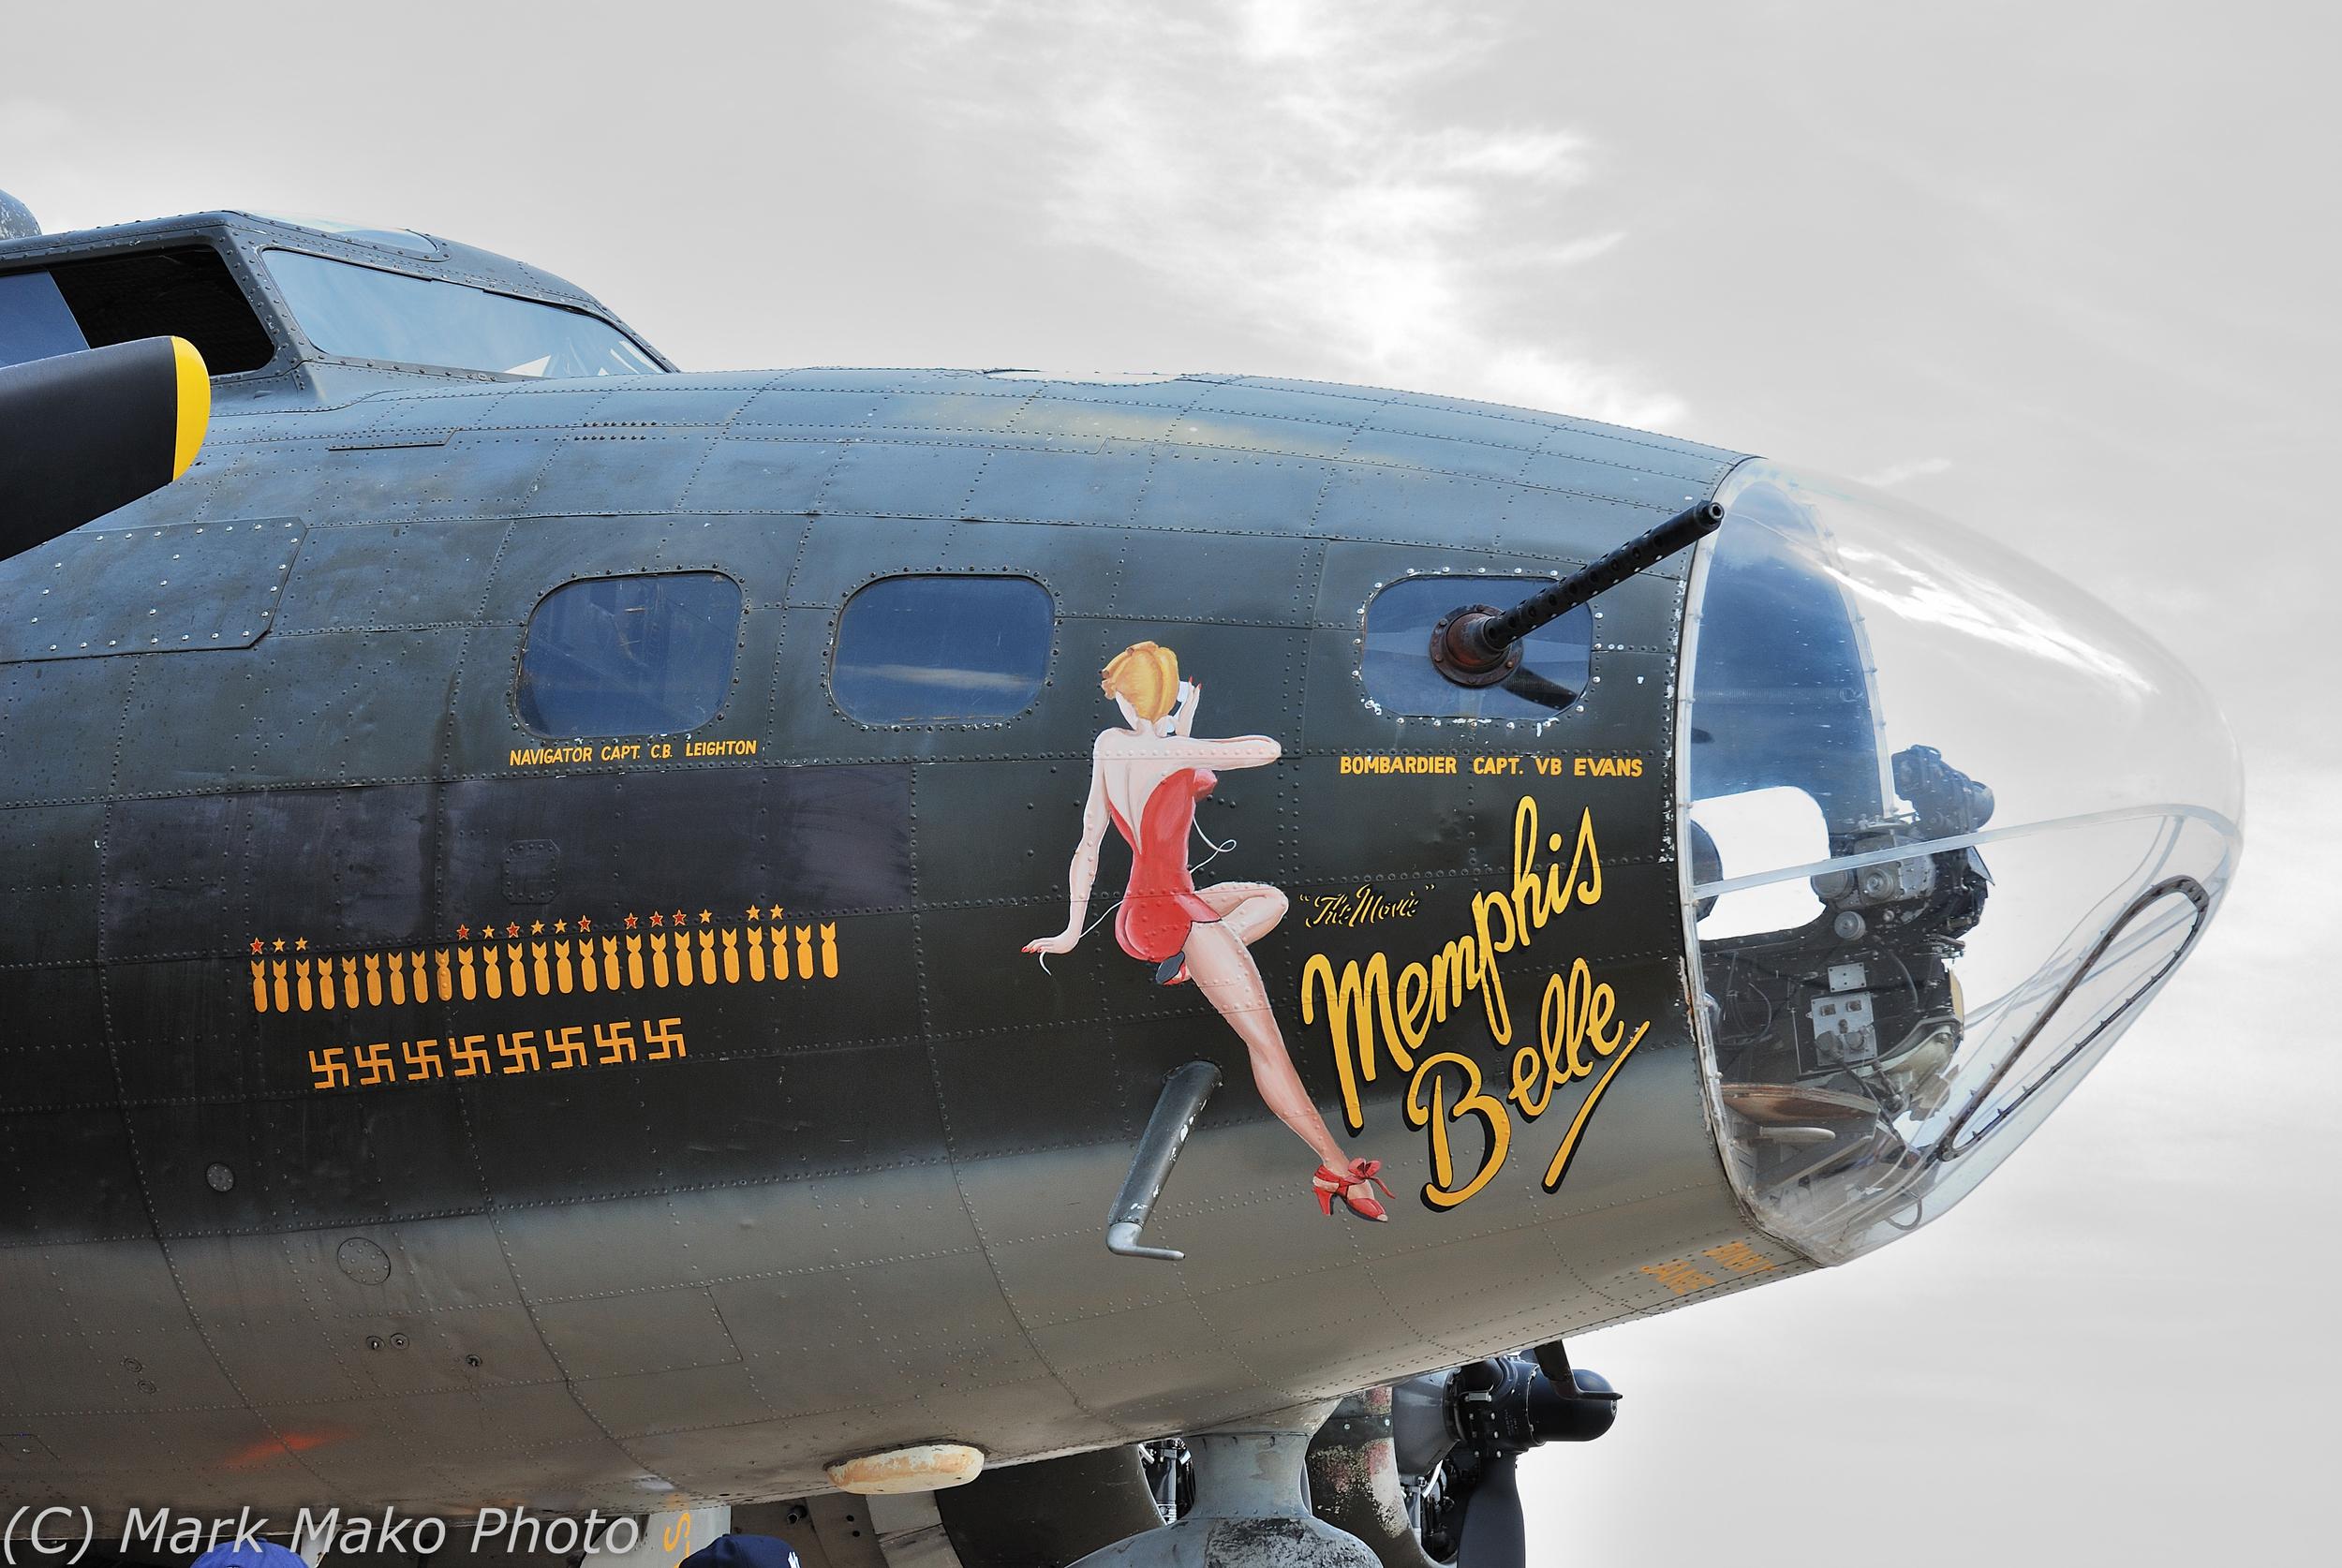 B-17: Memphis Belle